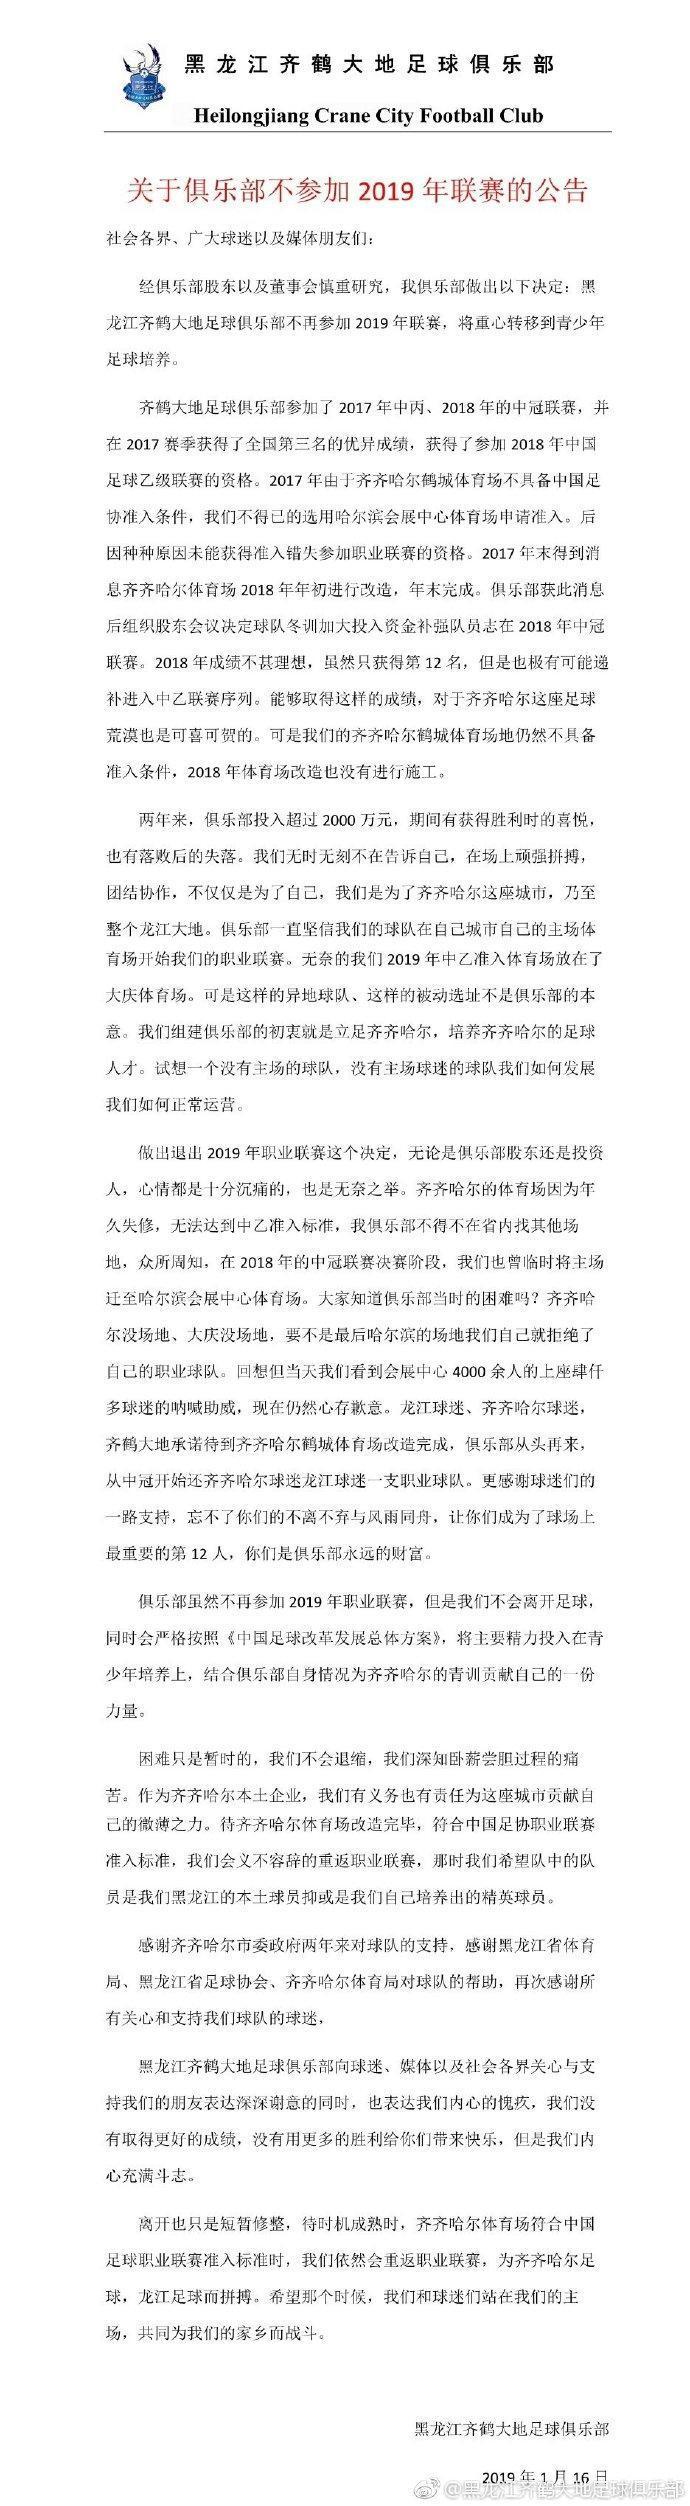 http://www.hljold.org.cn/shishangchaoliu/63048.html